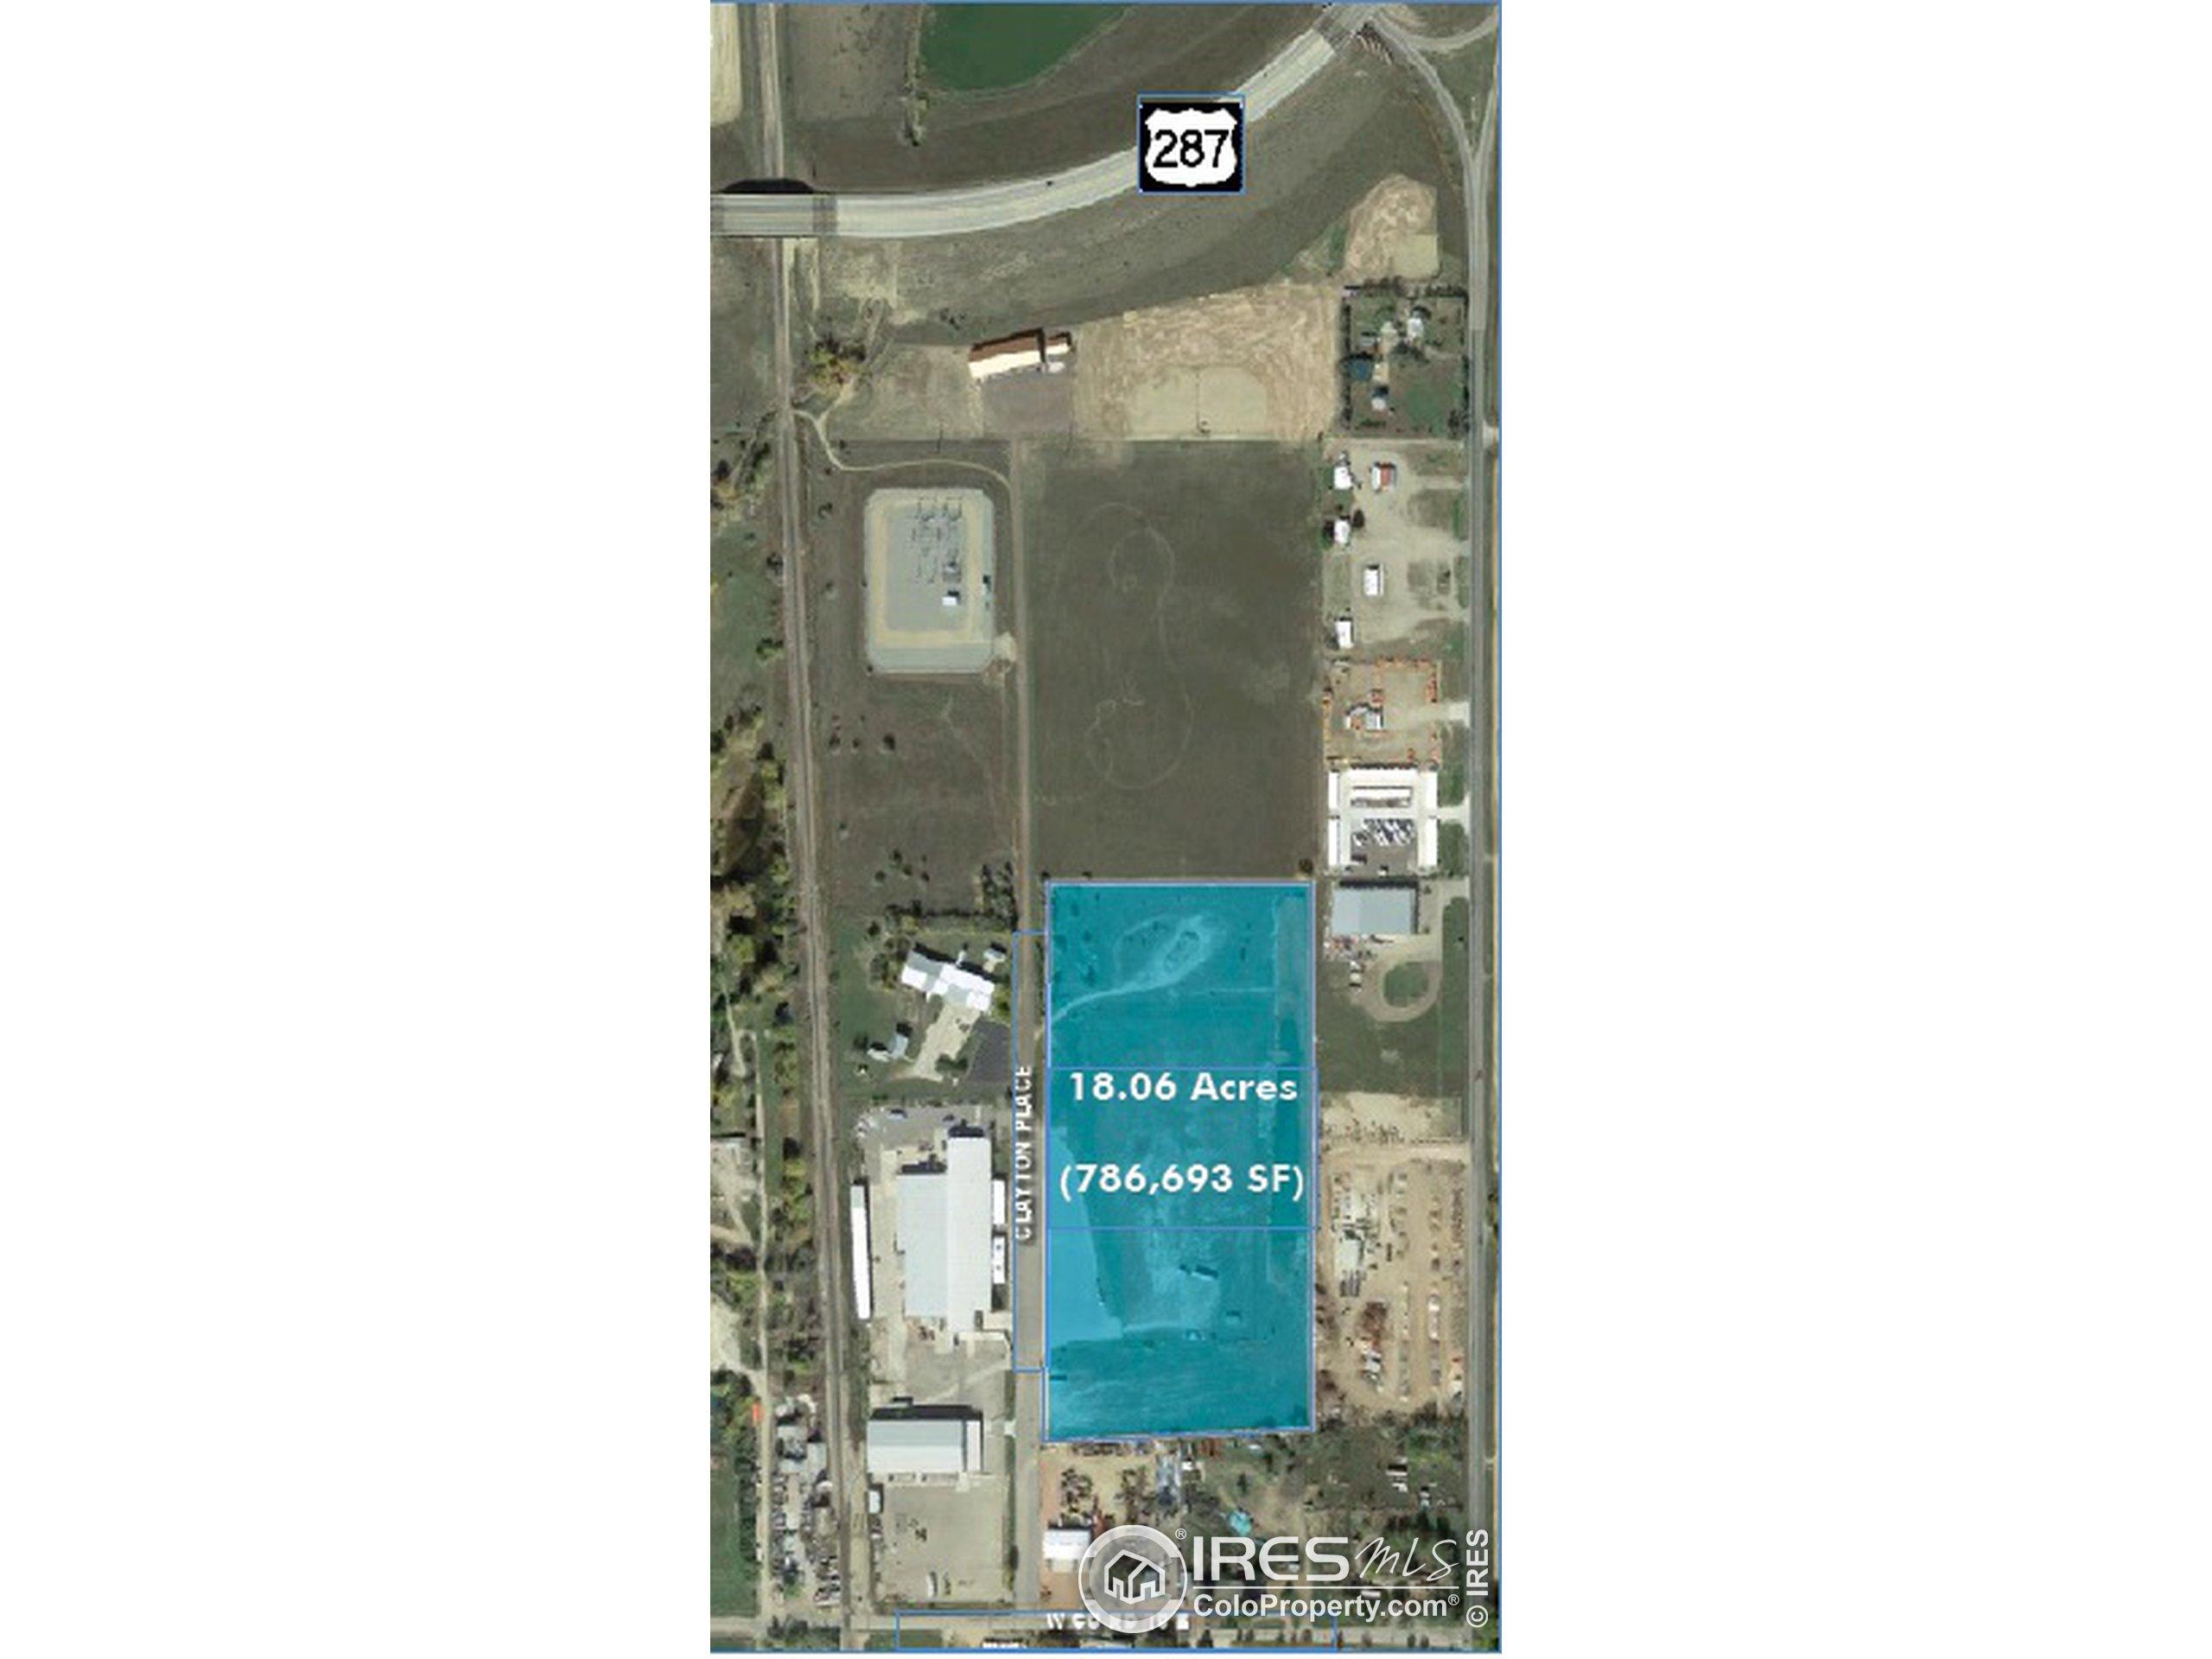 2221 Clayton Pl, Berthoud CO 80513 - Photo 1